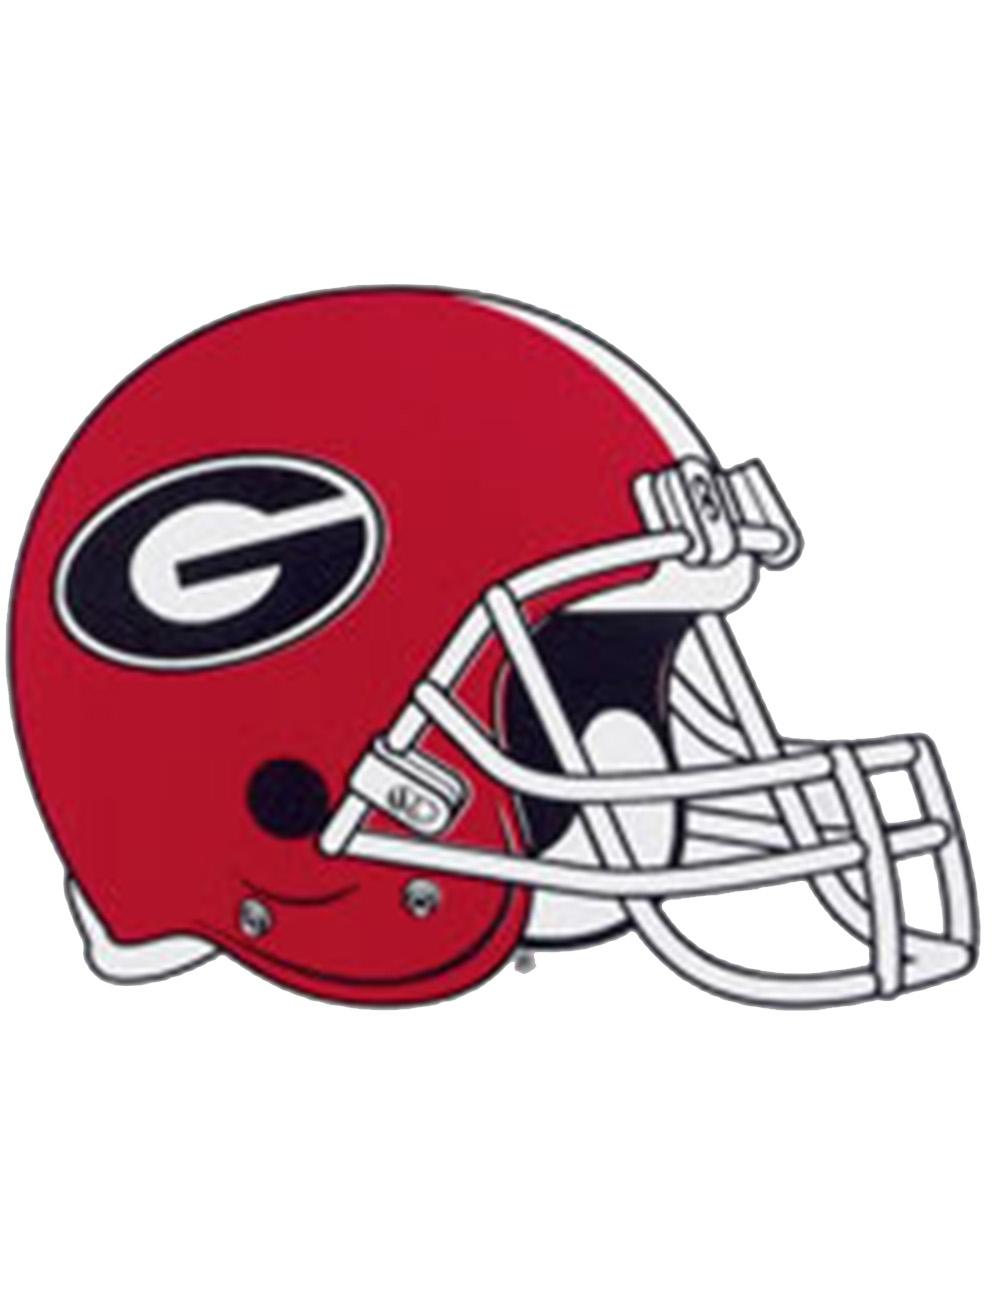 "GEORGIA BULLDOGS ***MINI*** Football Helmet Nameplate /""BIKE/"" Decal//Sticker"